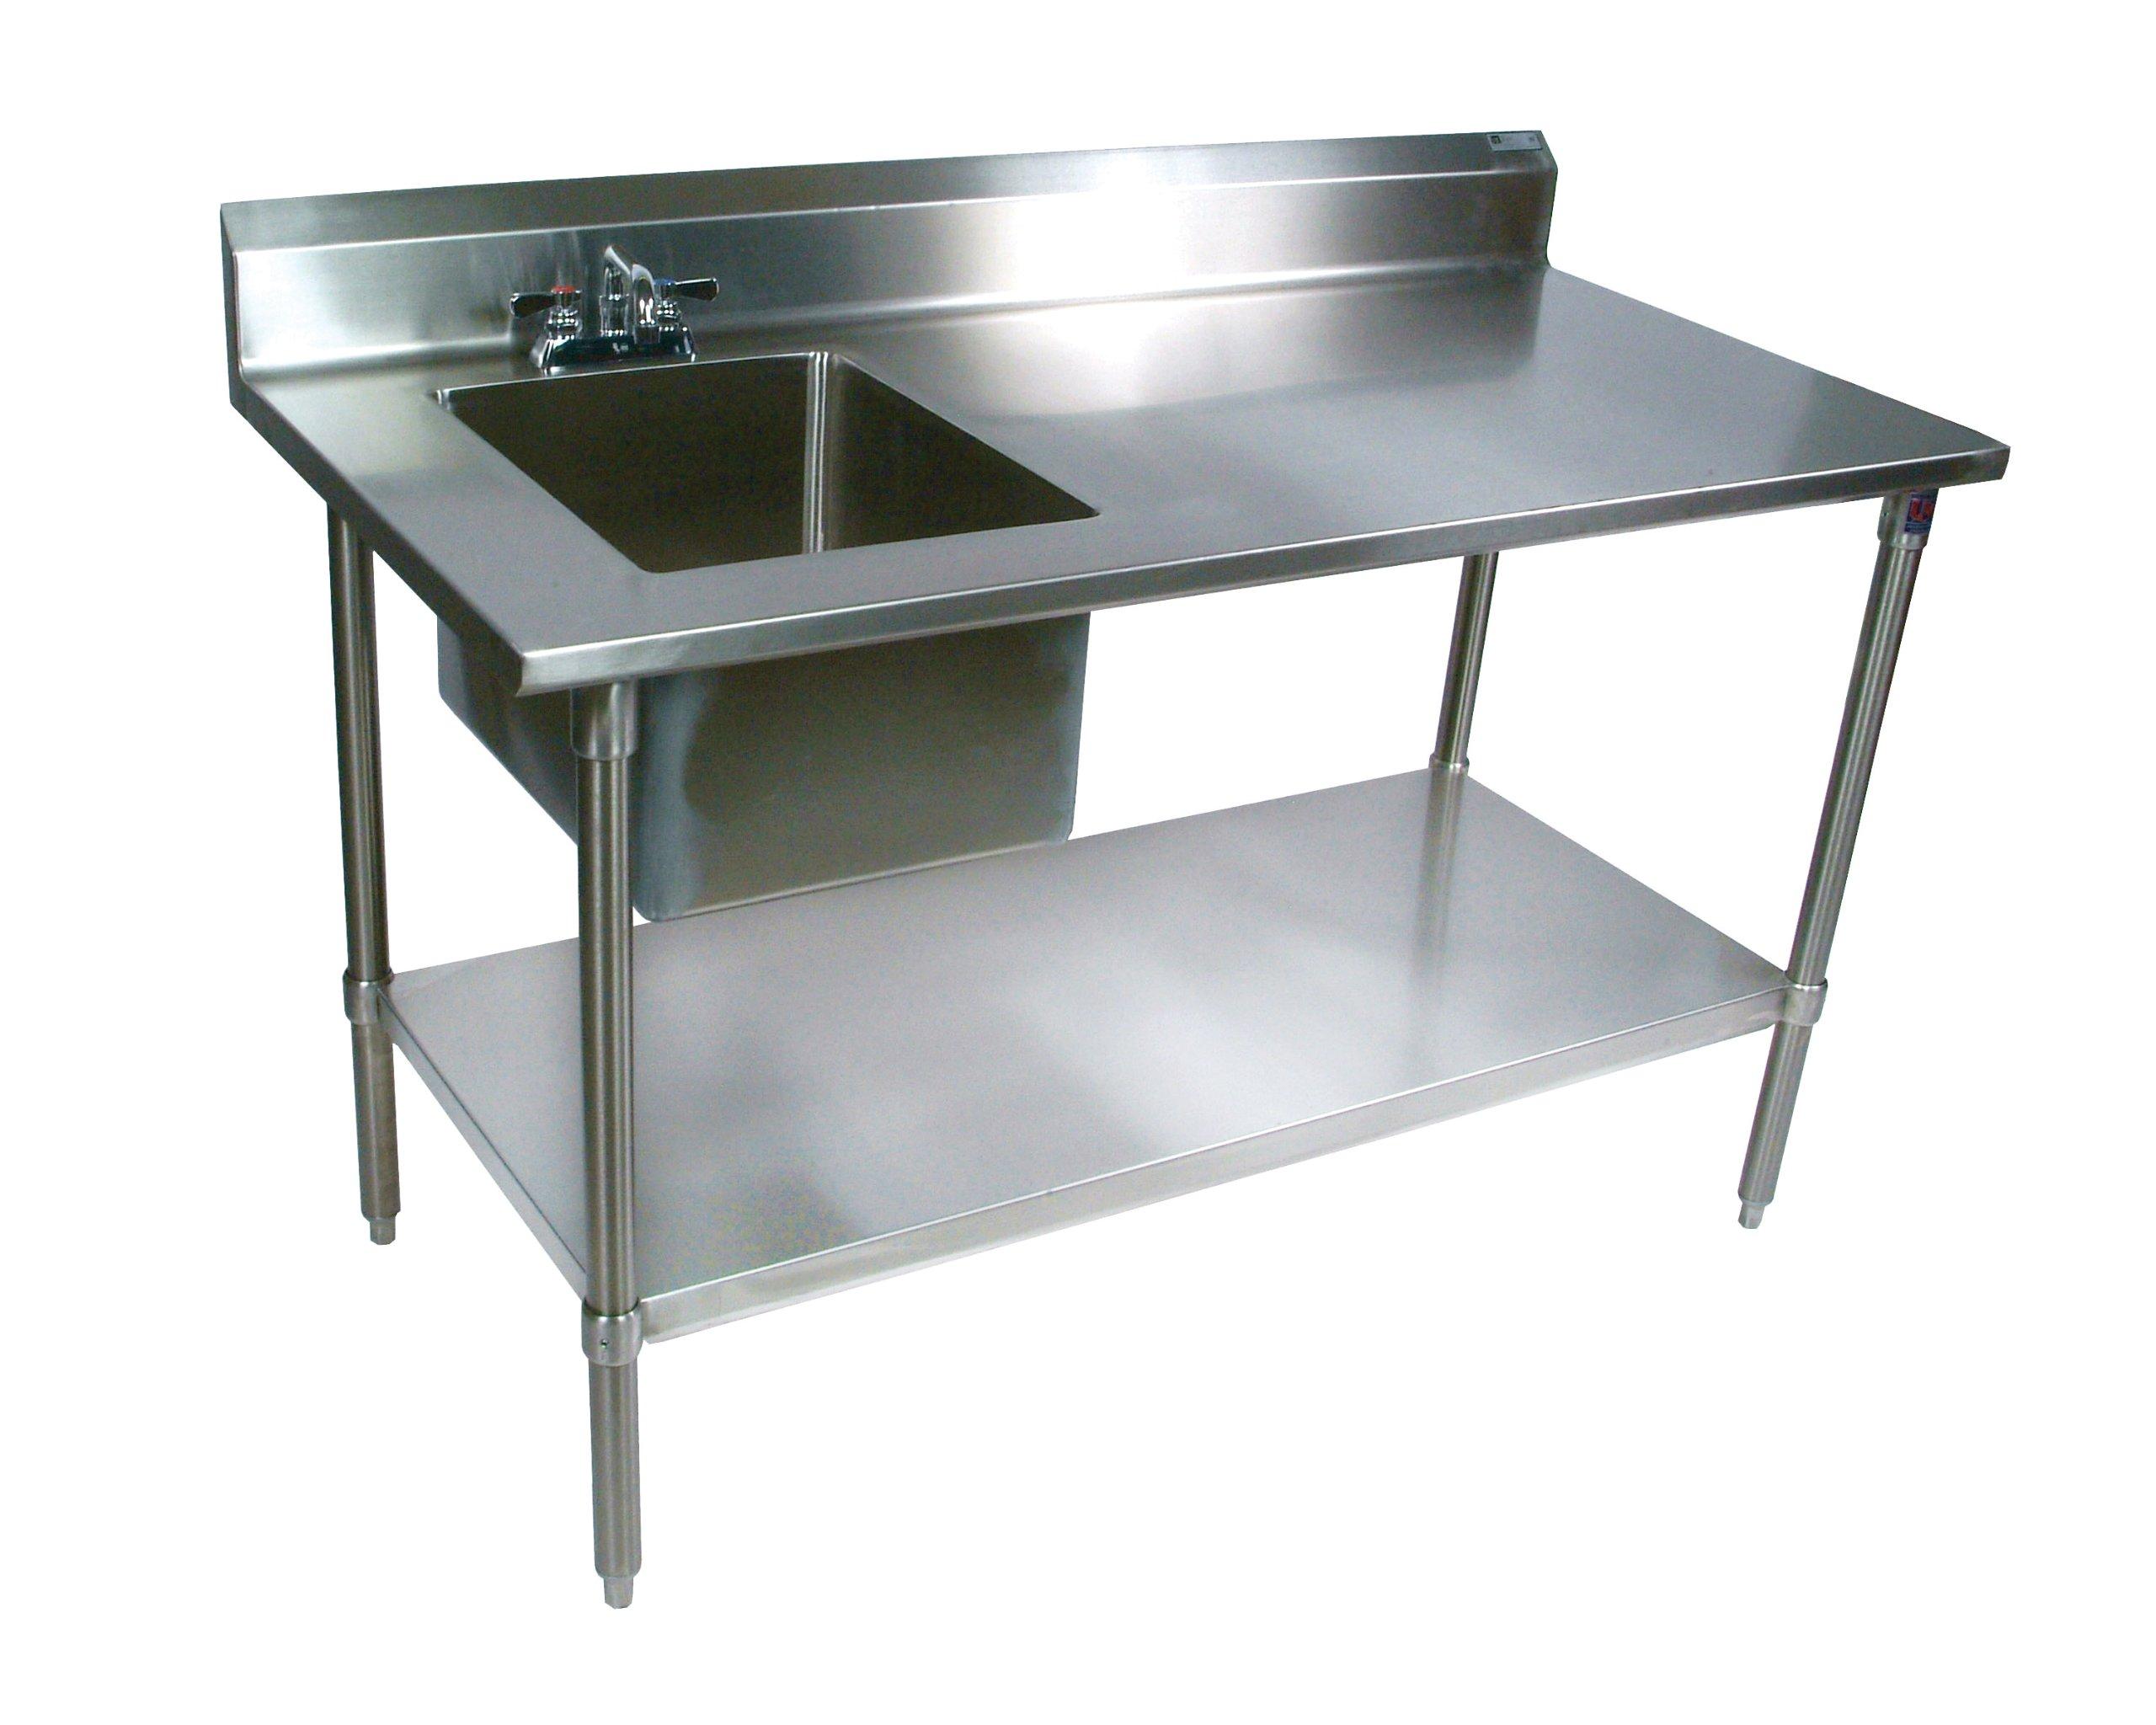 John Boos EPT6R5-3060GSK-L Stainless Steel Prep Table with Sink Bowl, Galvanized Undershelf, 60'' Length x 30'' Width, Left Hand Side